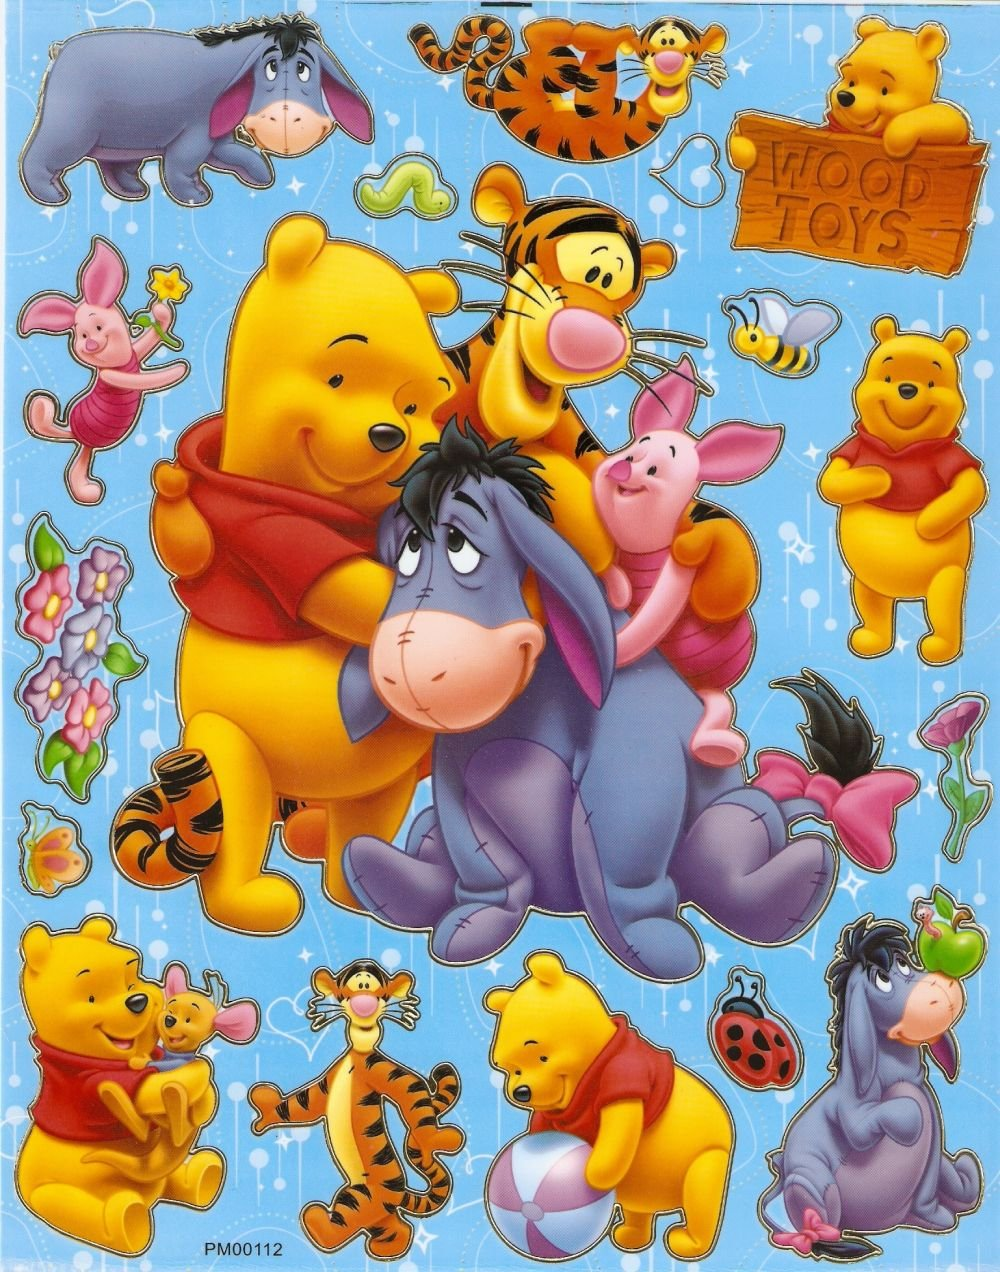 10 Big sheets Winnie Pooh Buy 2 lots Bonus 1  #PM00112